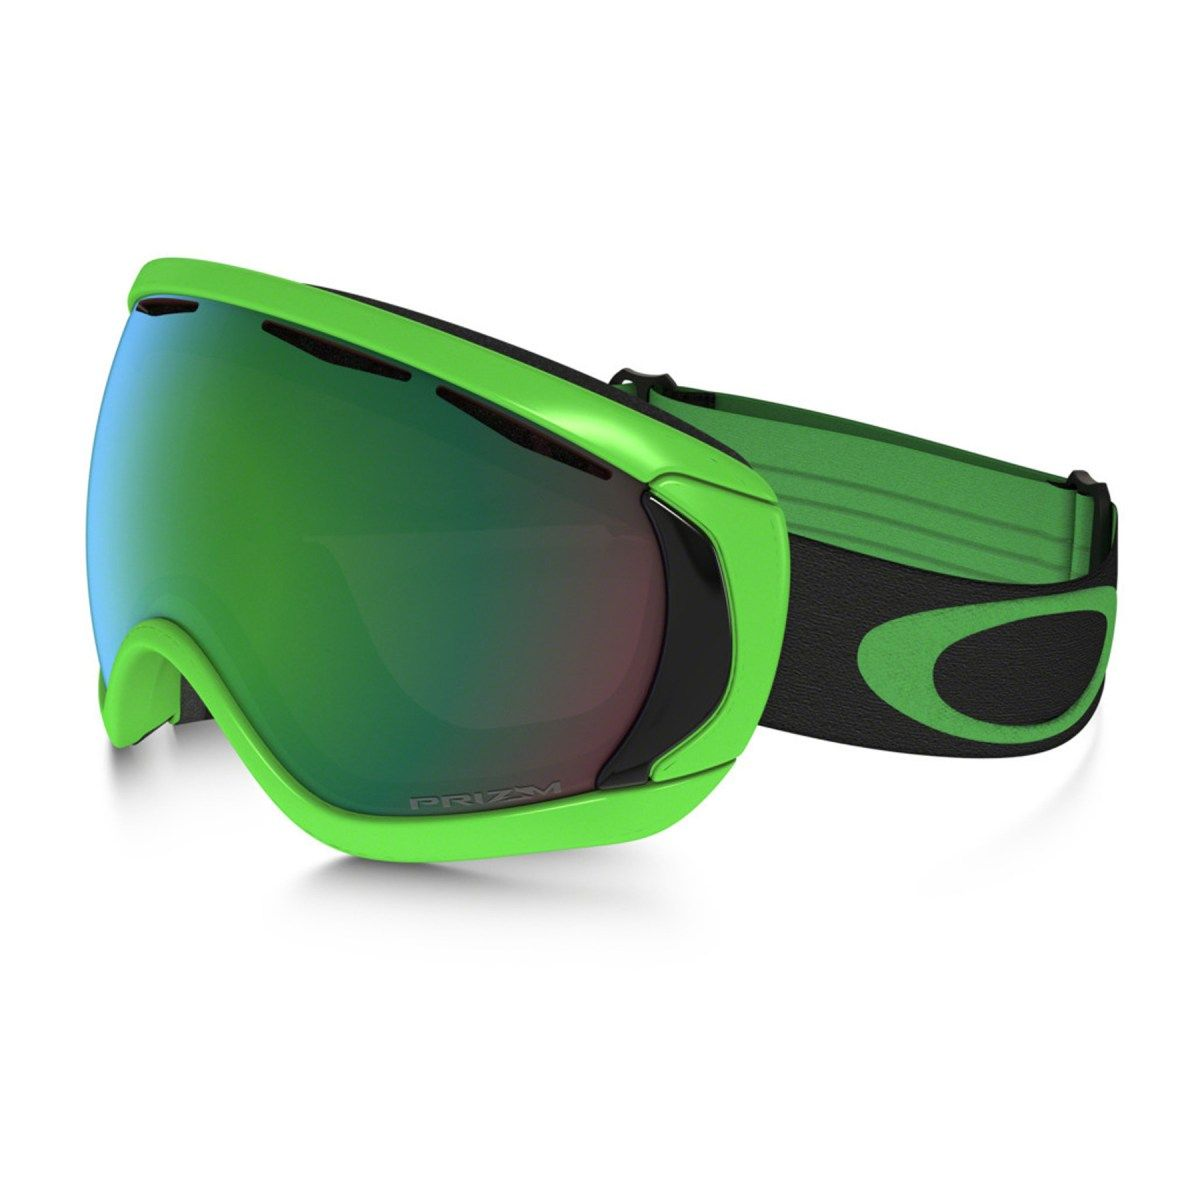 0f465db30641 Men s Oakley Snowboard Goggles - Oakley Canopy. 80 Green - Prizm Jade  Iridium